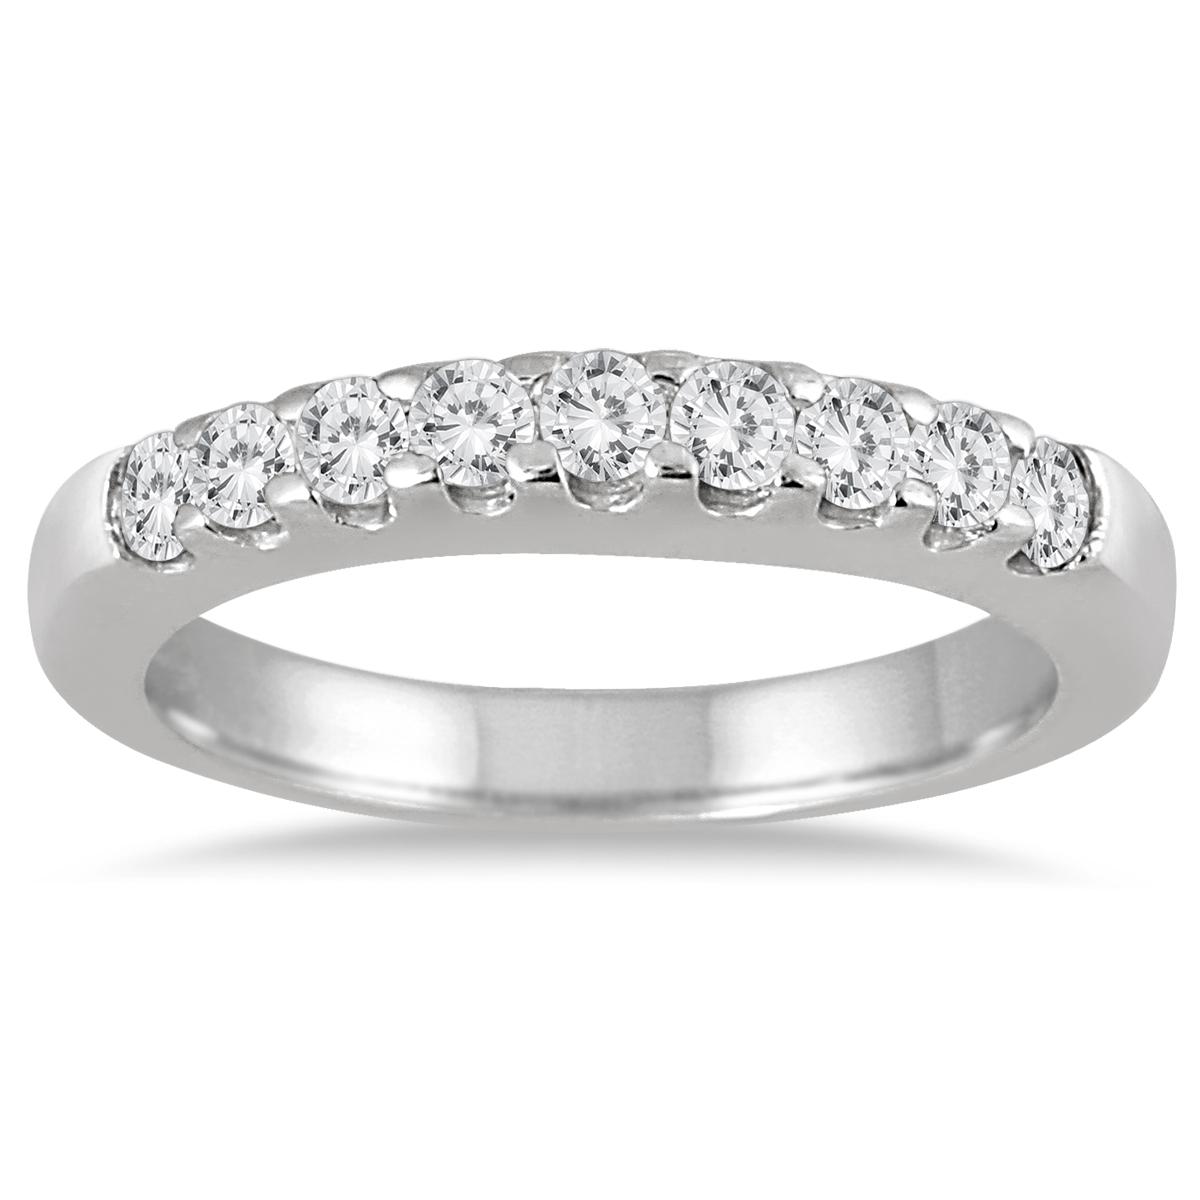 1/2 Carat TW Nine Stone Diamond Wedding Band in 10K White Gold